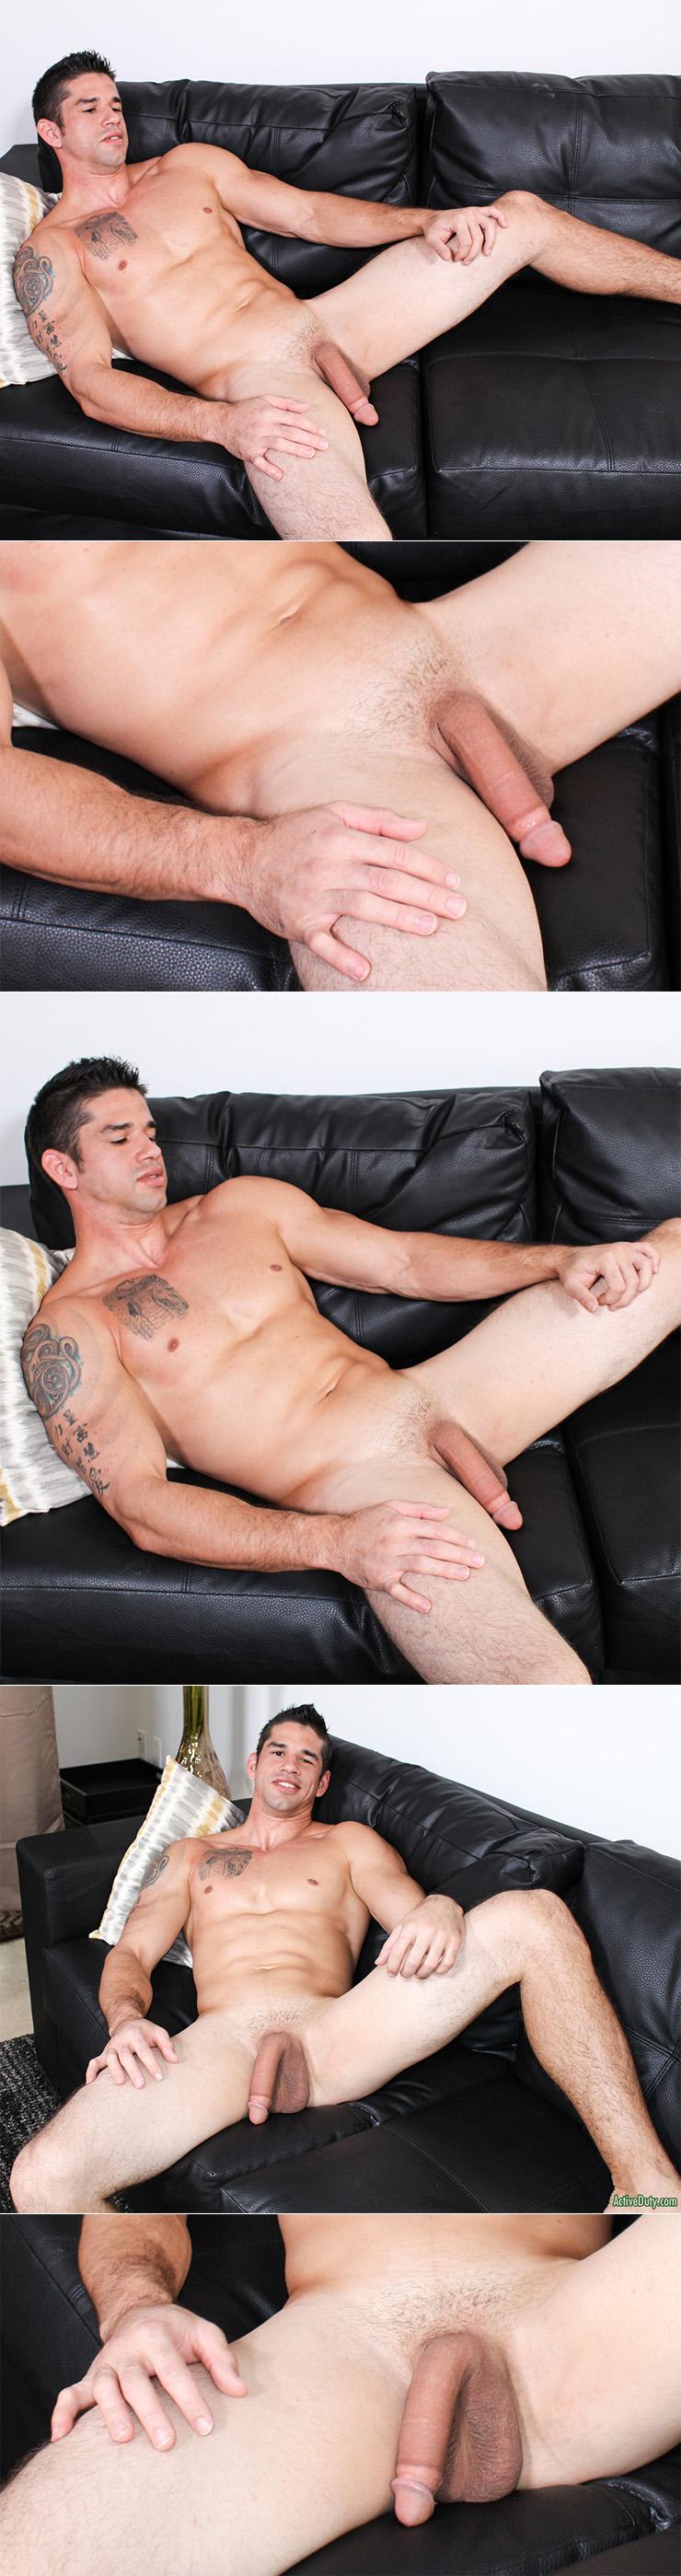 ActiveDuty Jason Richards Solo Masturbation Scene Big Cock Military Dude Tattoos Muscular Man 2